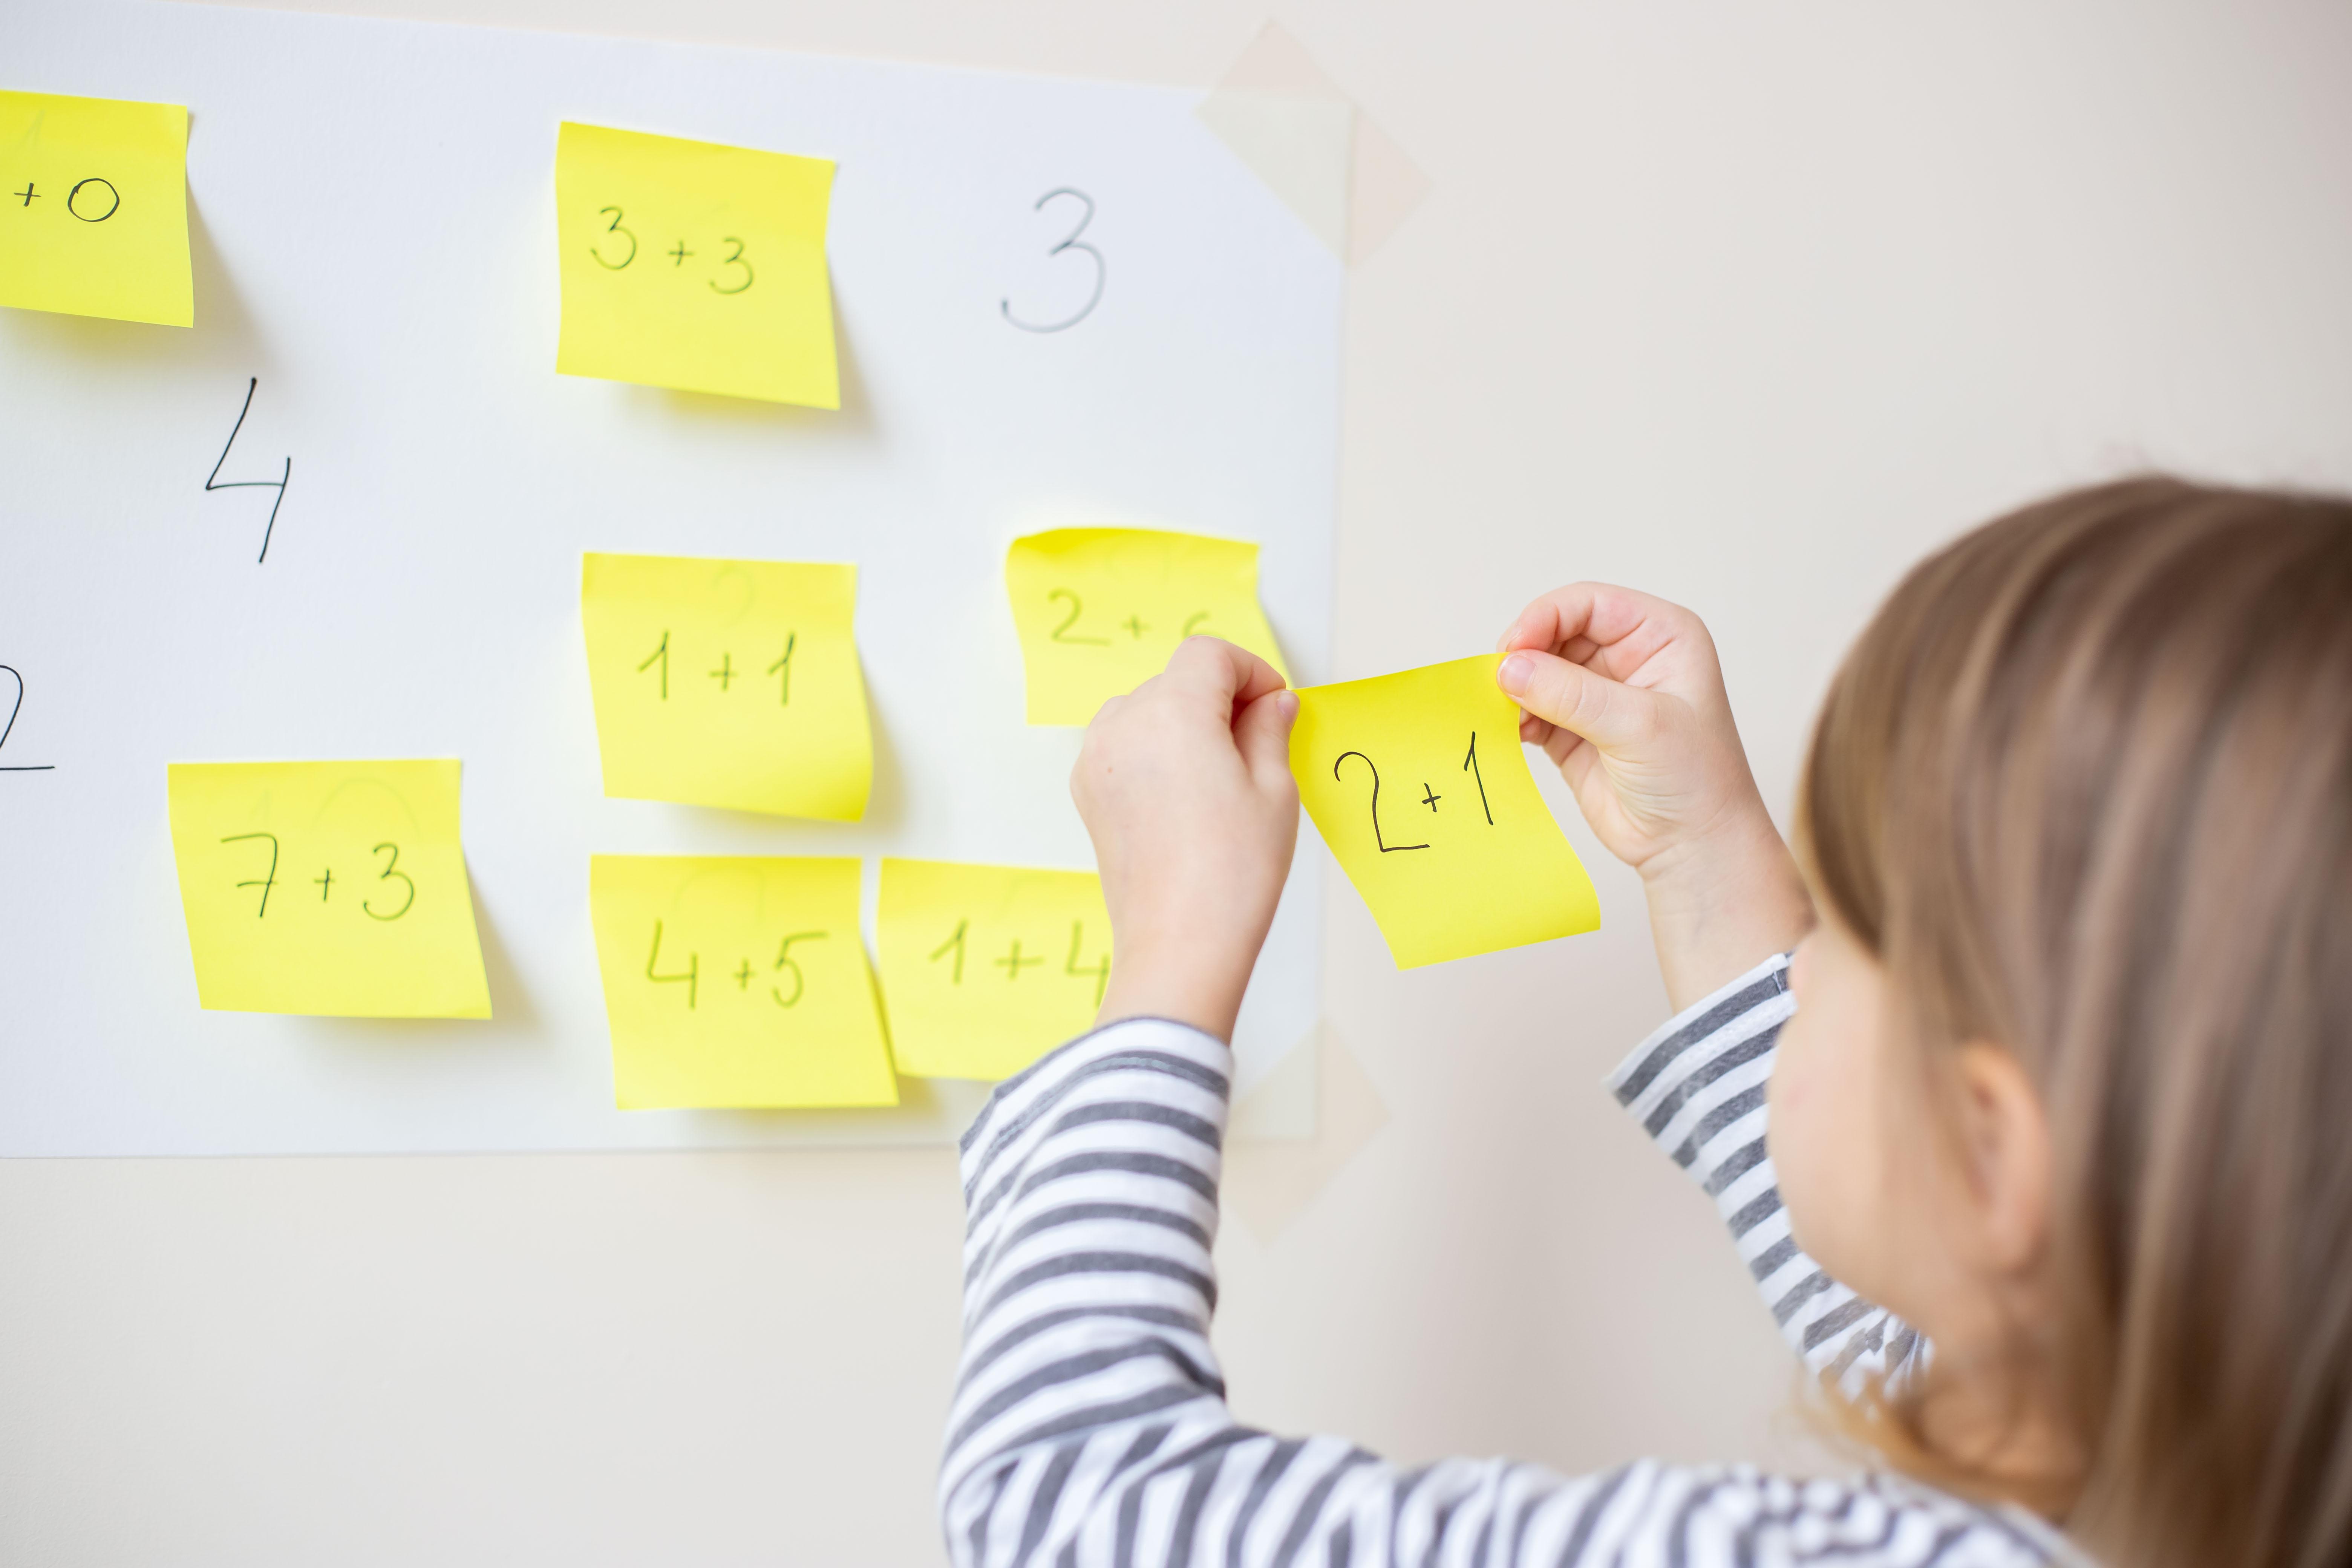 Student working on basic math practice.